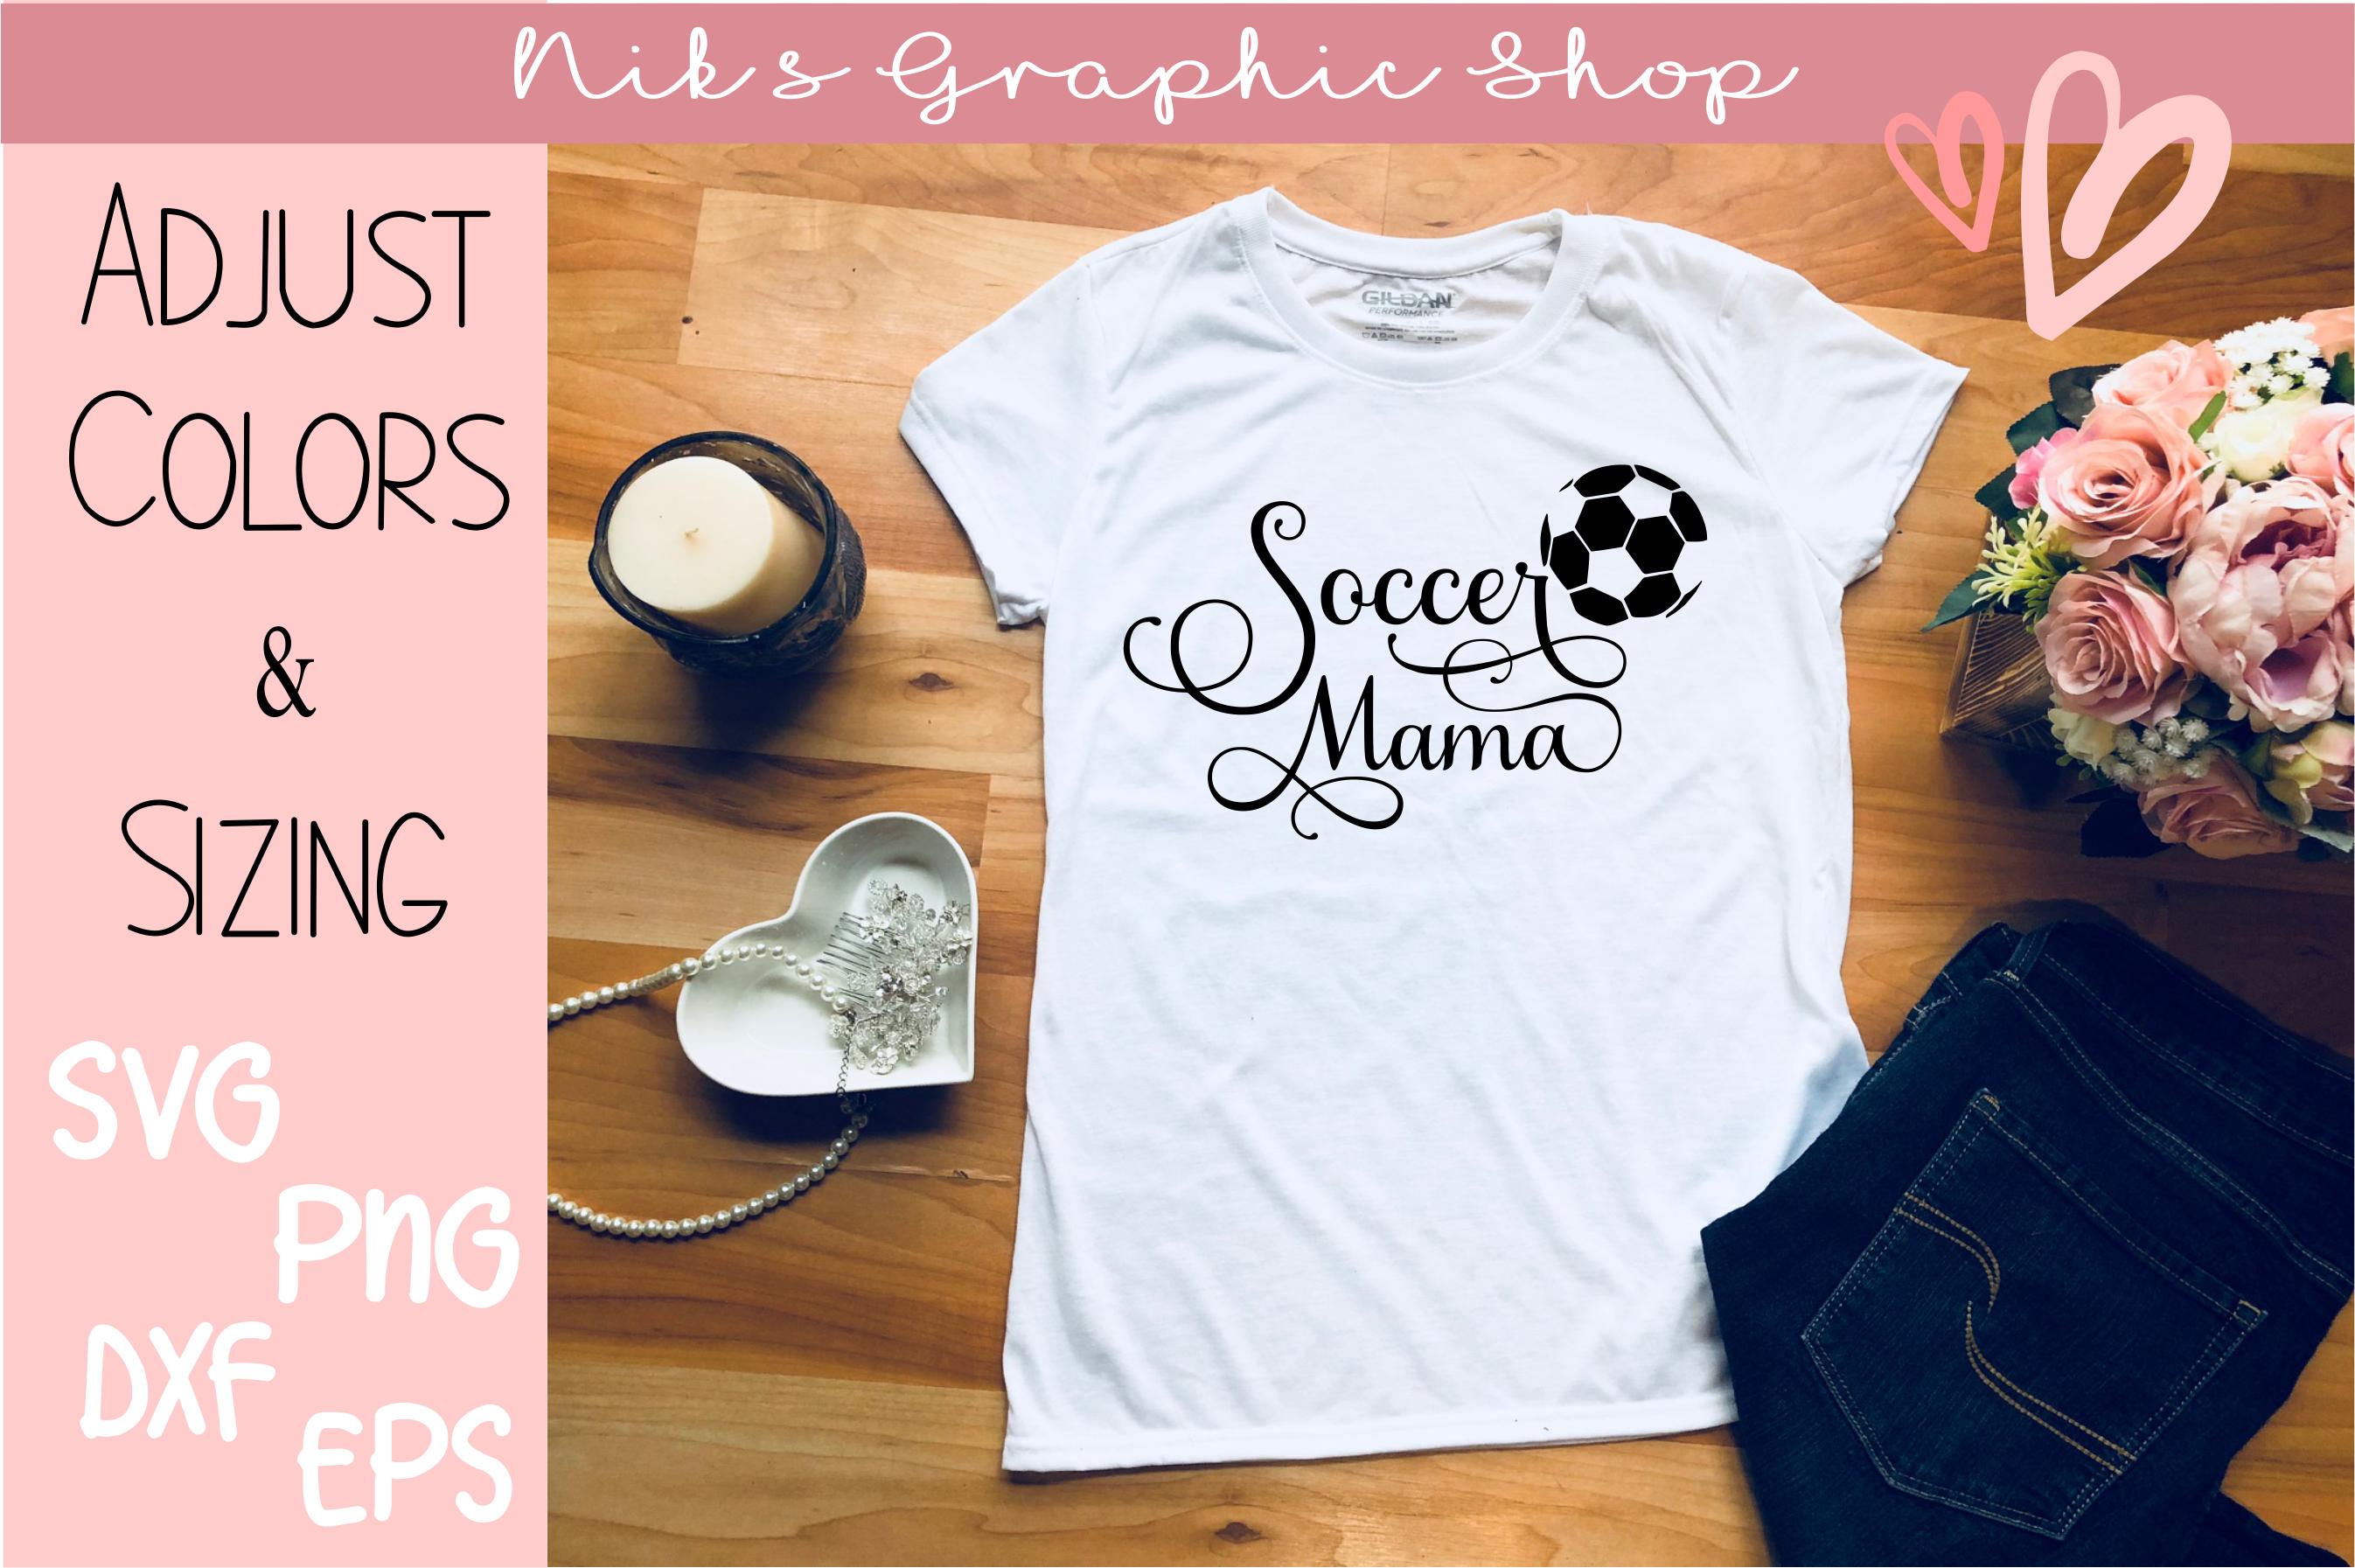 Soccer mama svg, soccer mom svg, soccer mama, Soccer Mom Svg example image 1